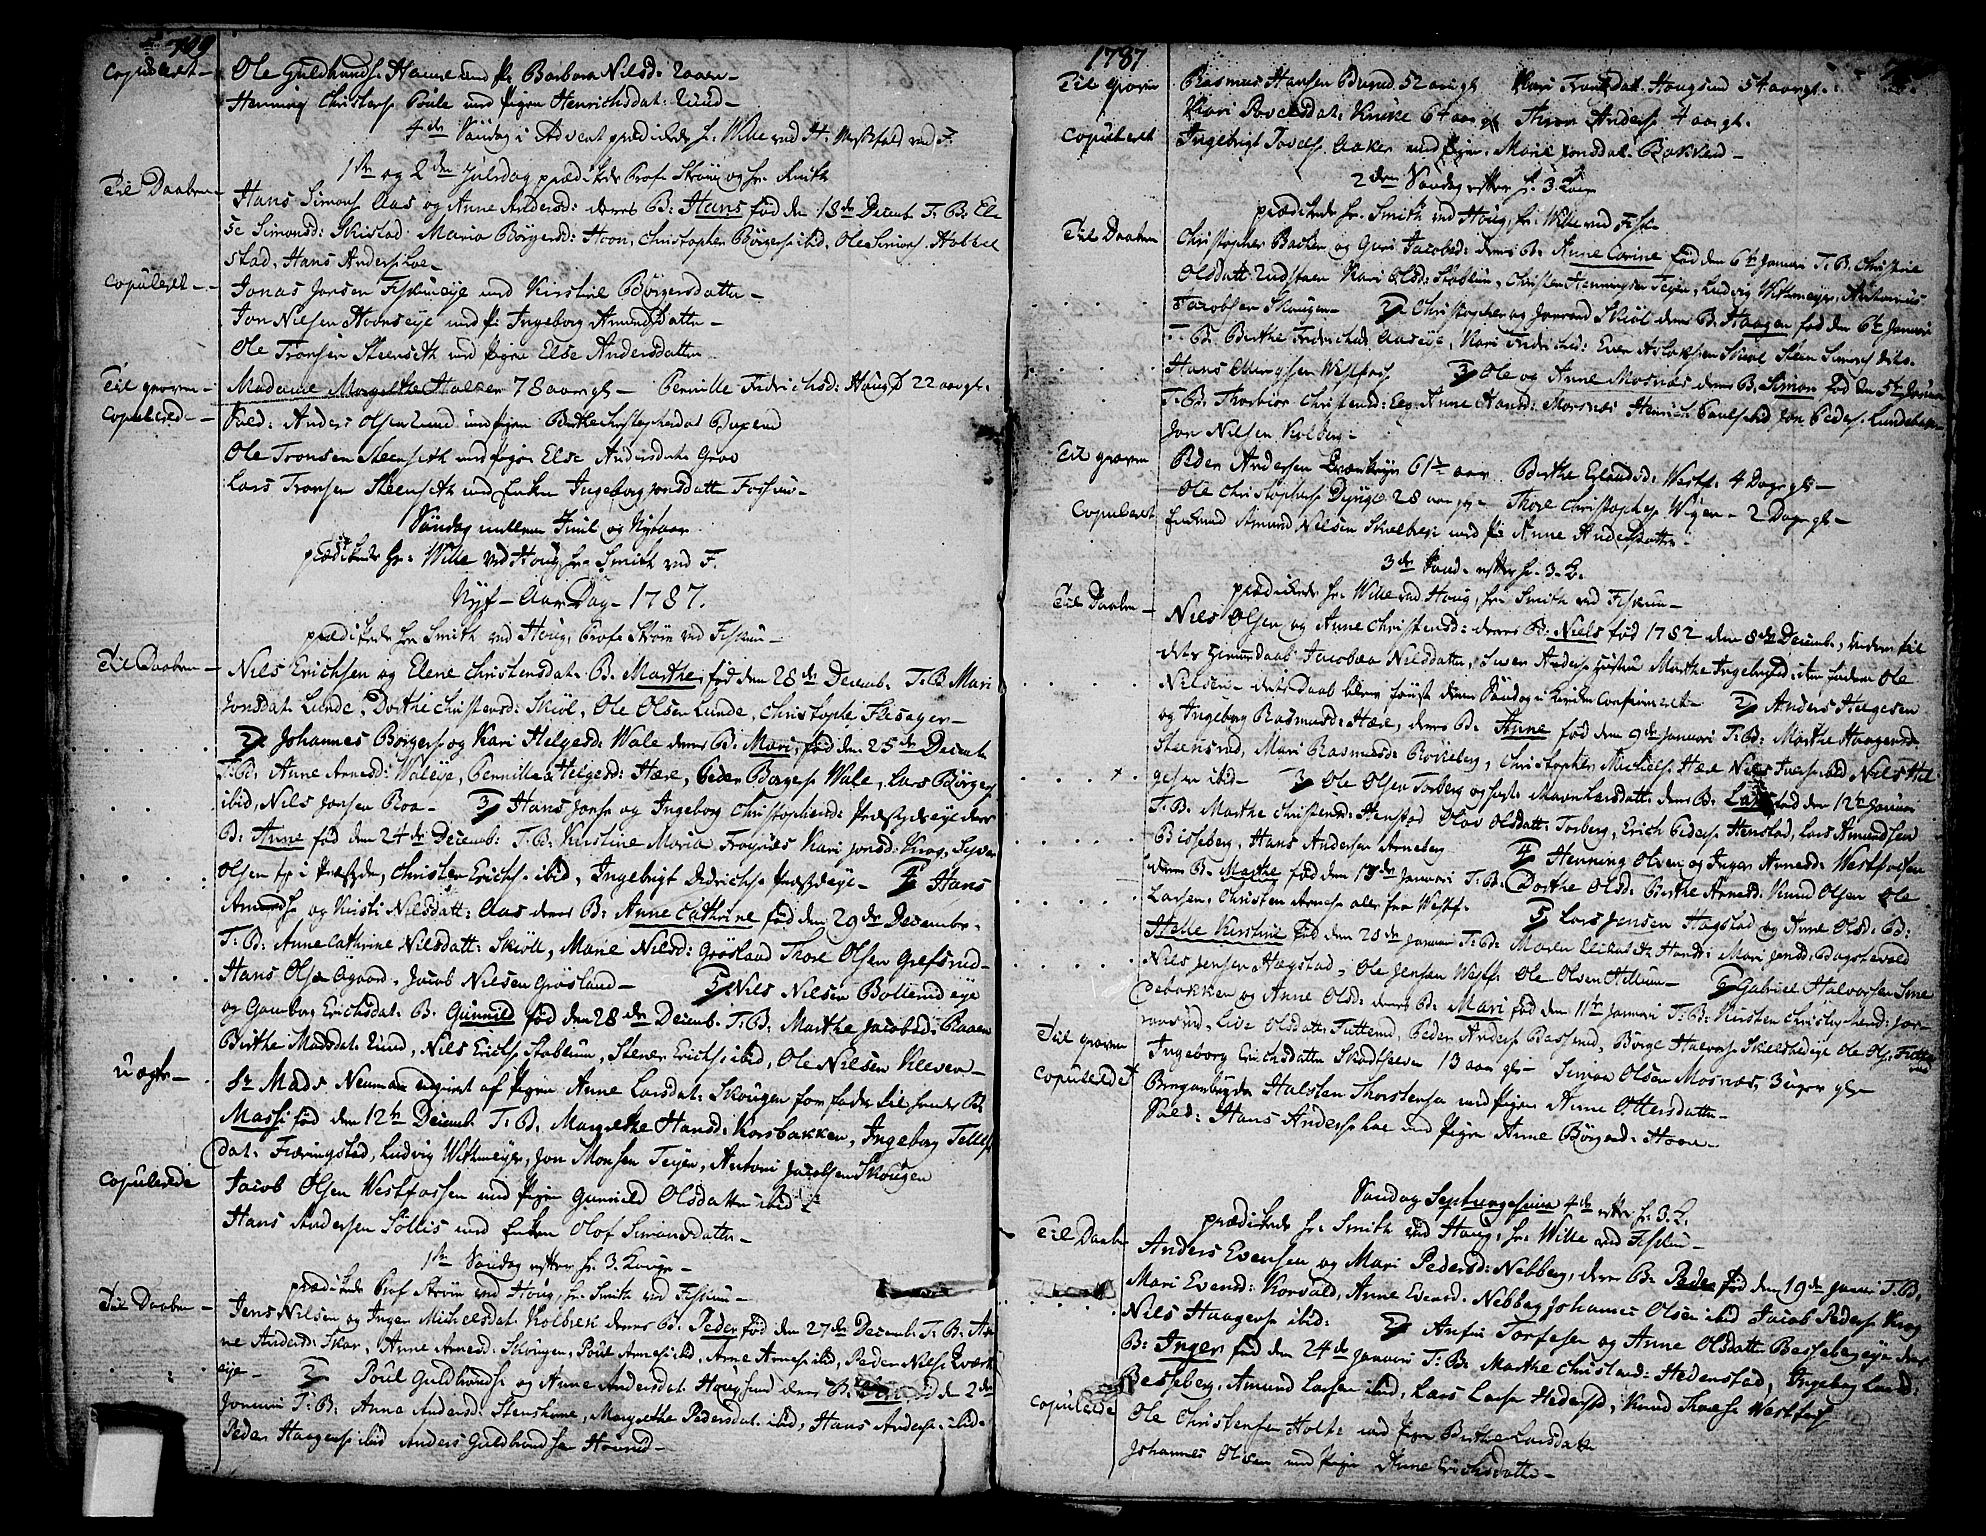 SAKO, Eiker kirkebøker, F/Fa/L0008: Ministerialbok nr. I 8, 1764-1788, s. 709-710